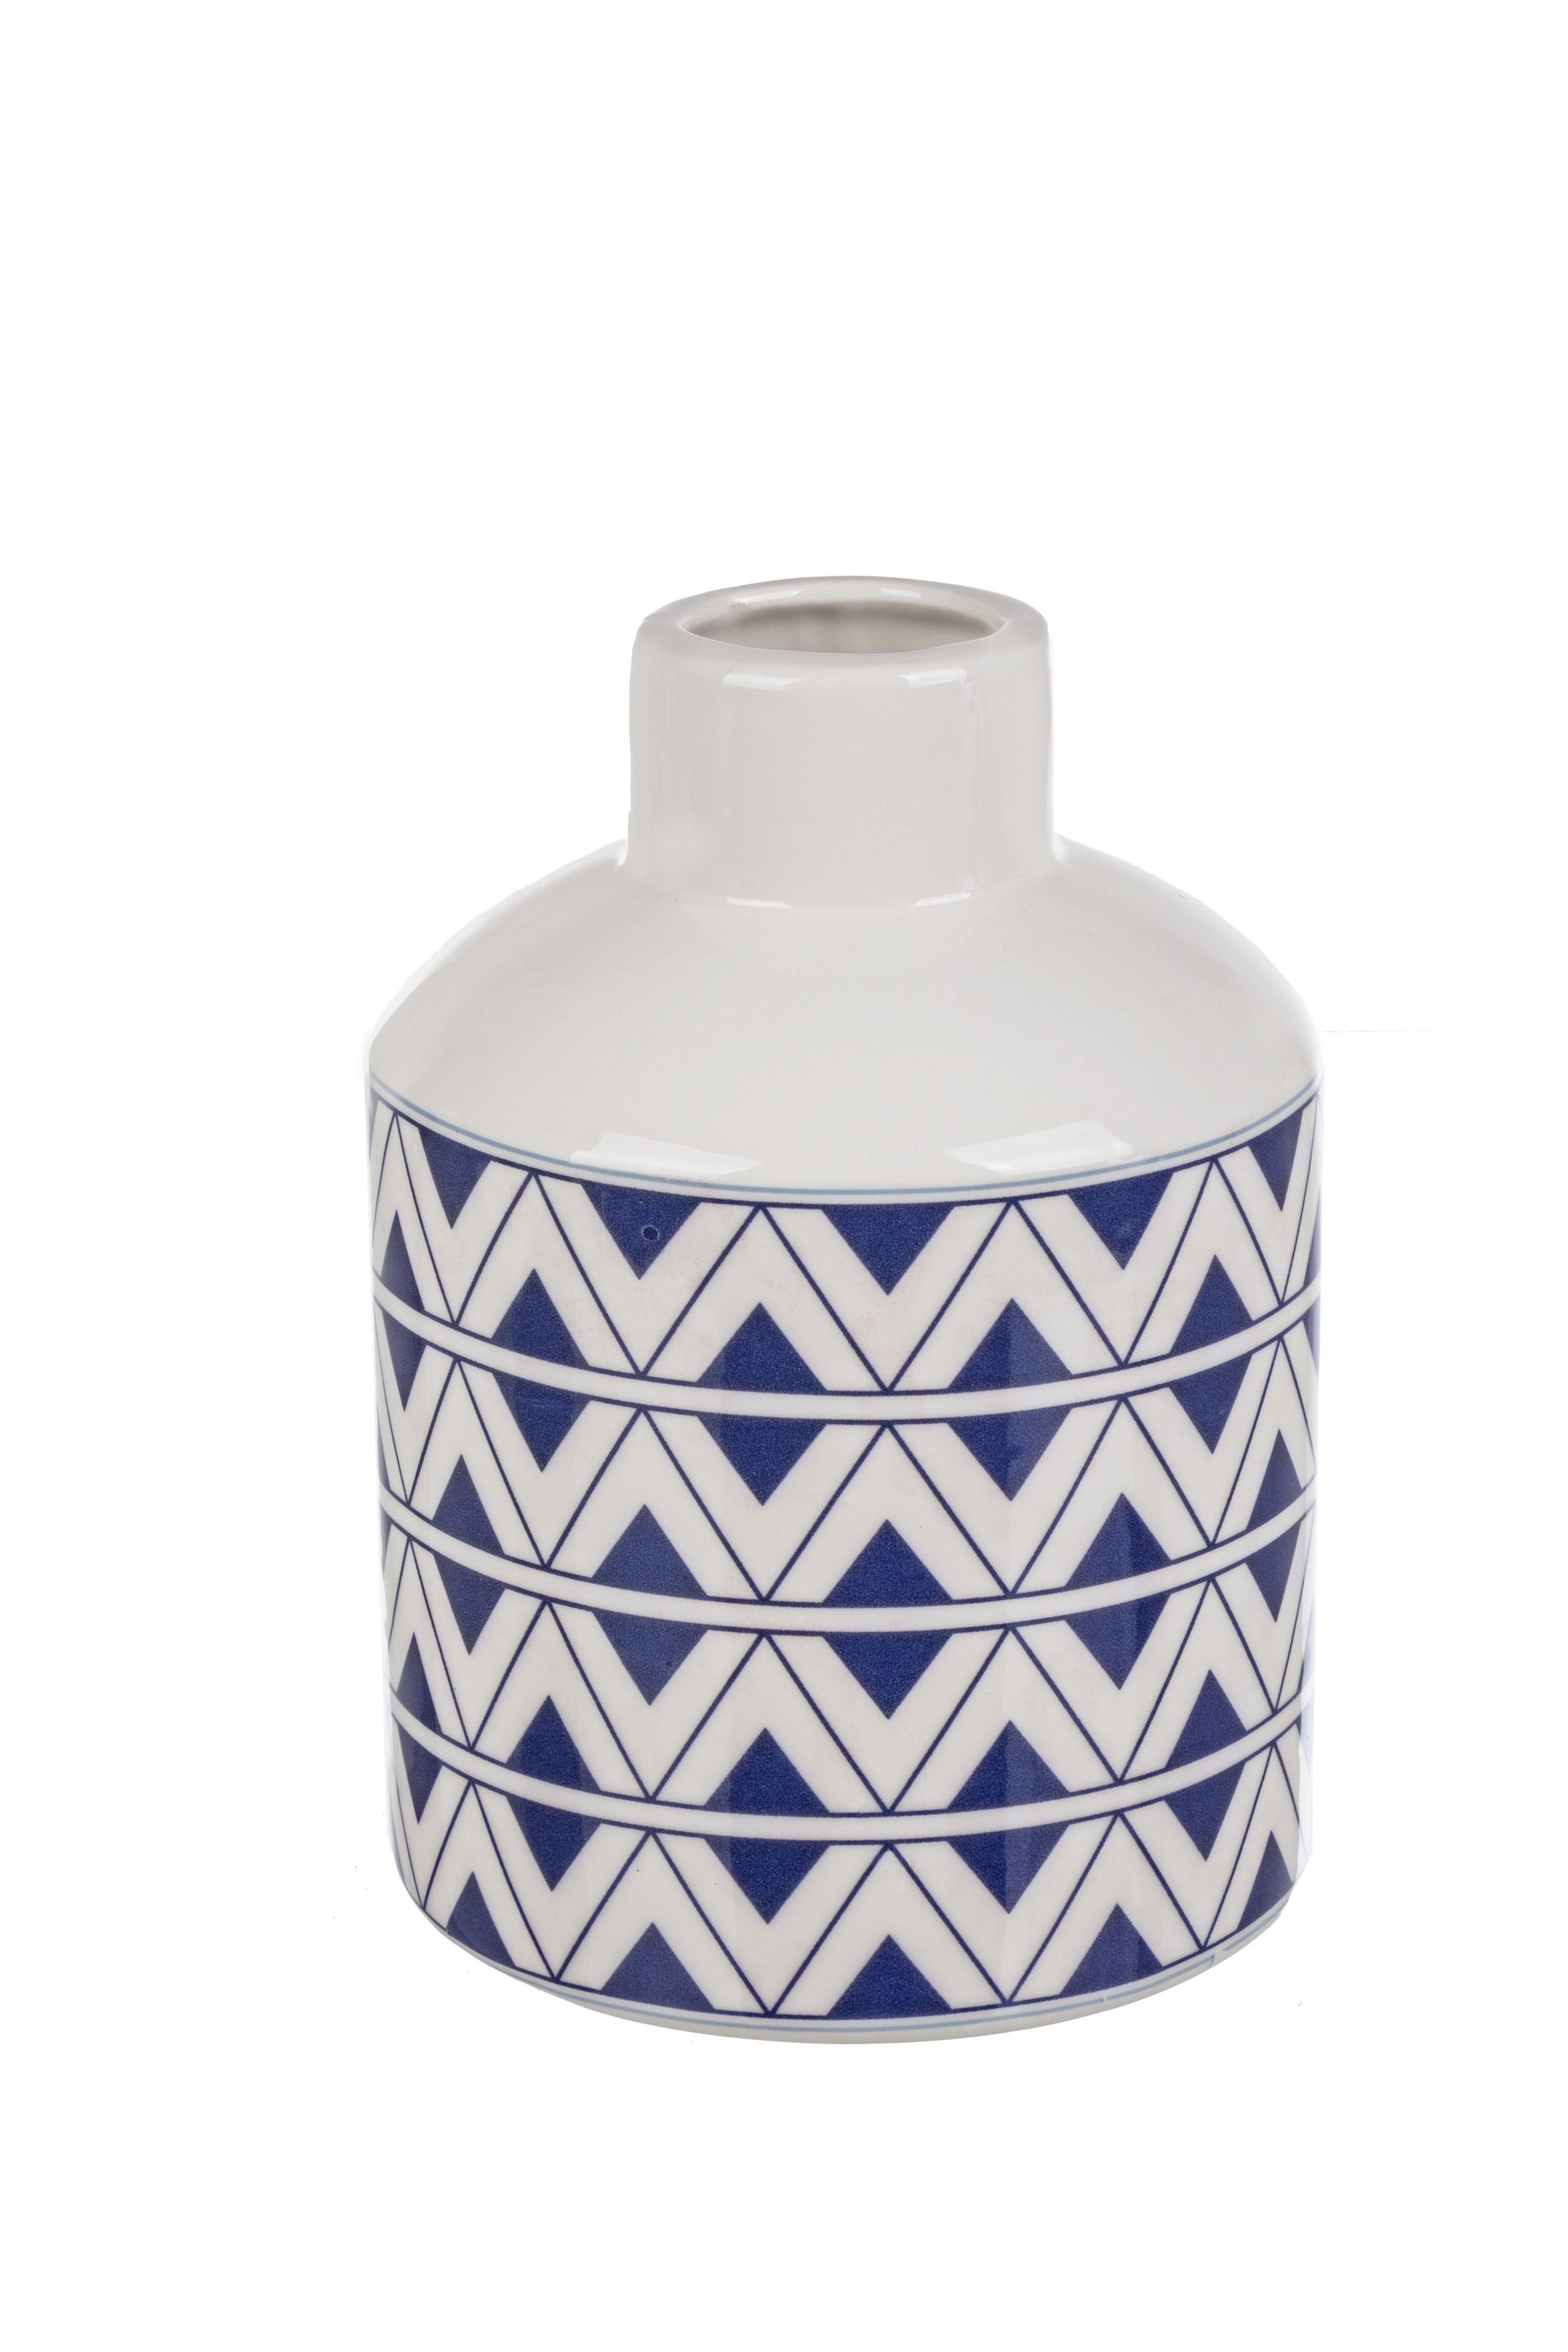 Vaza decorativa din ceramica Tunisi L Alb / Albastru, Ø15,8xH21,5 cm poza